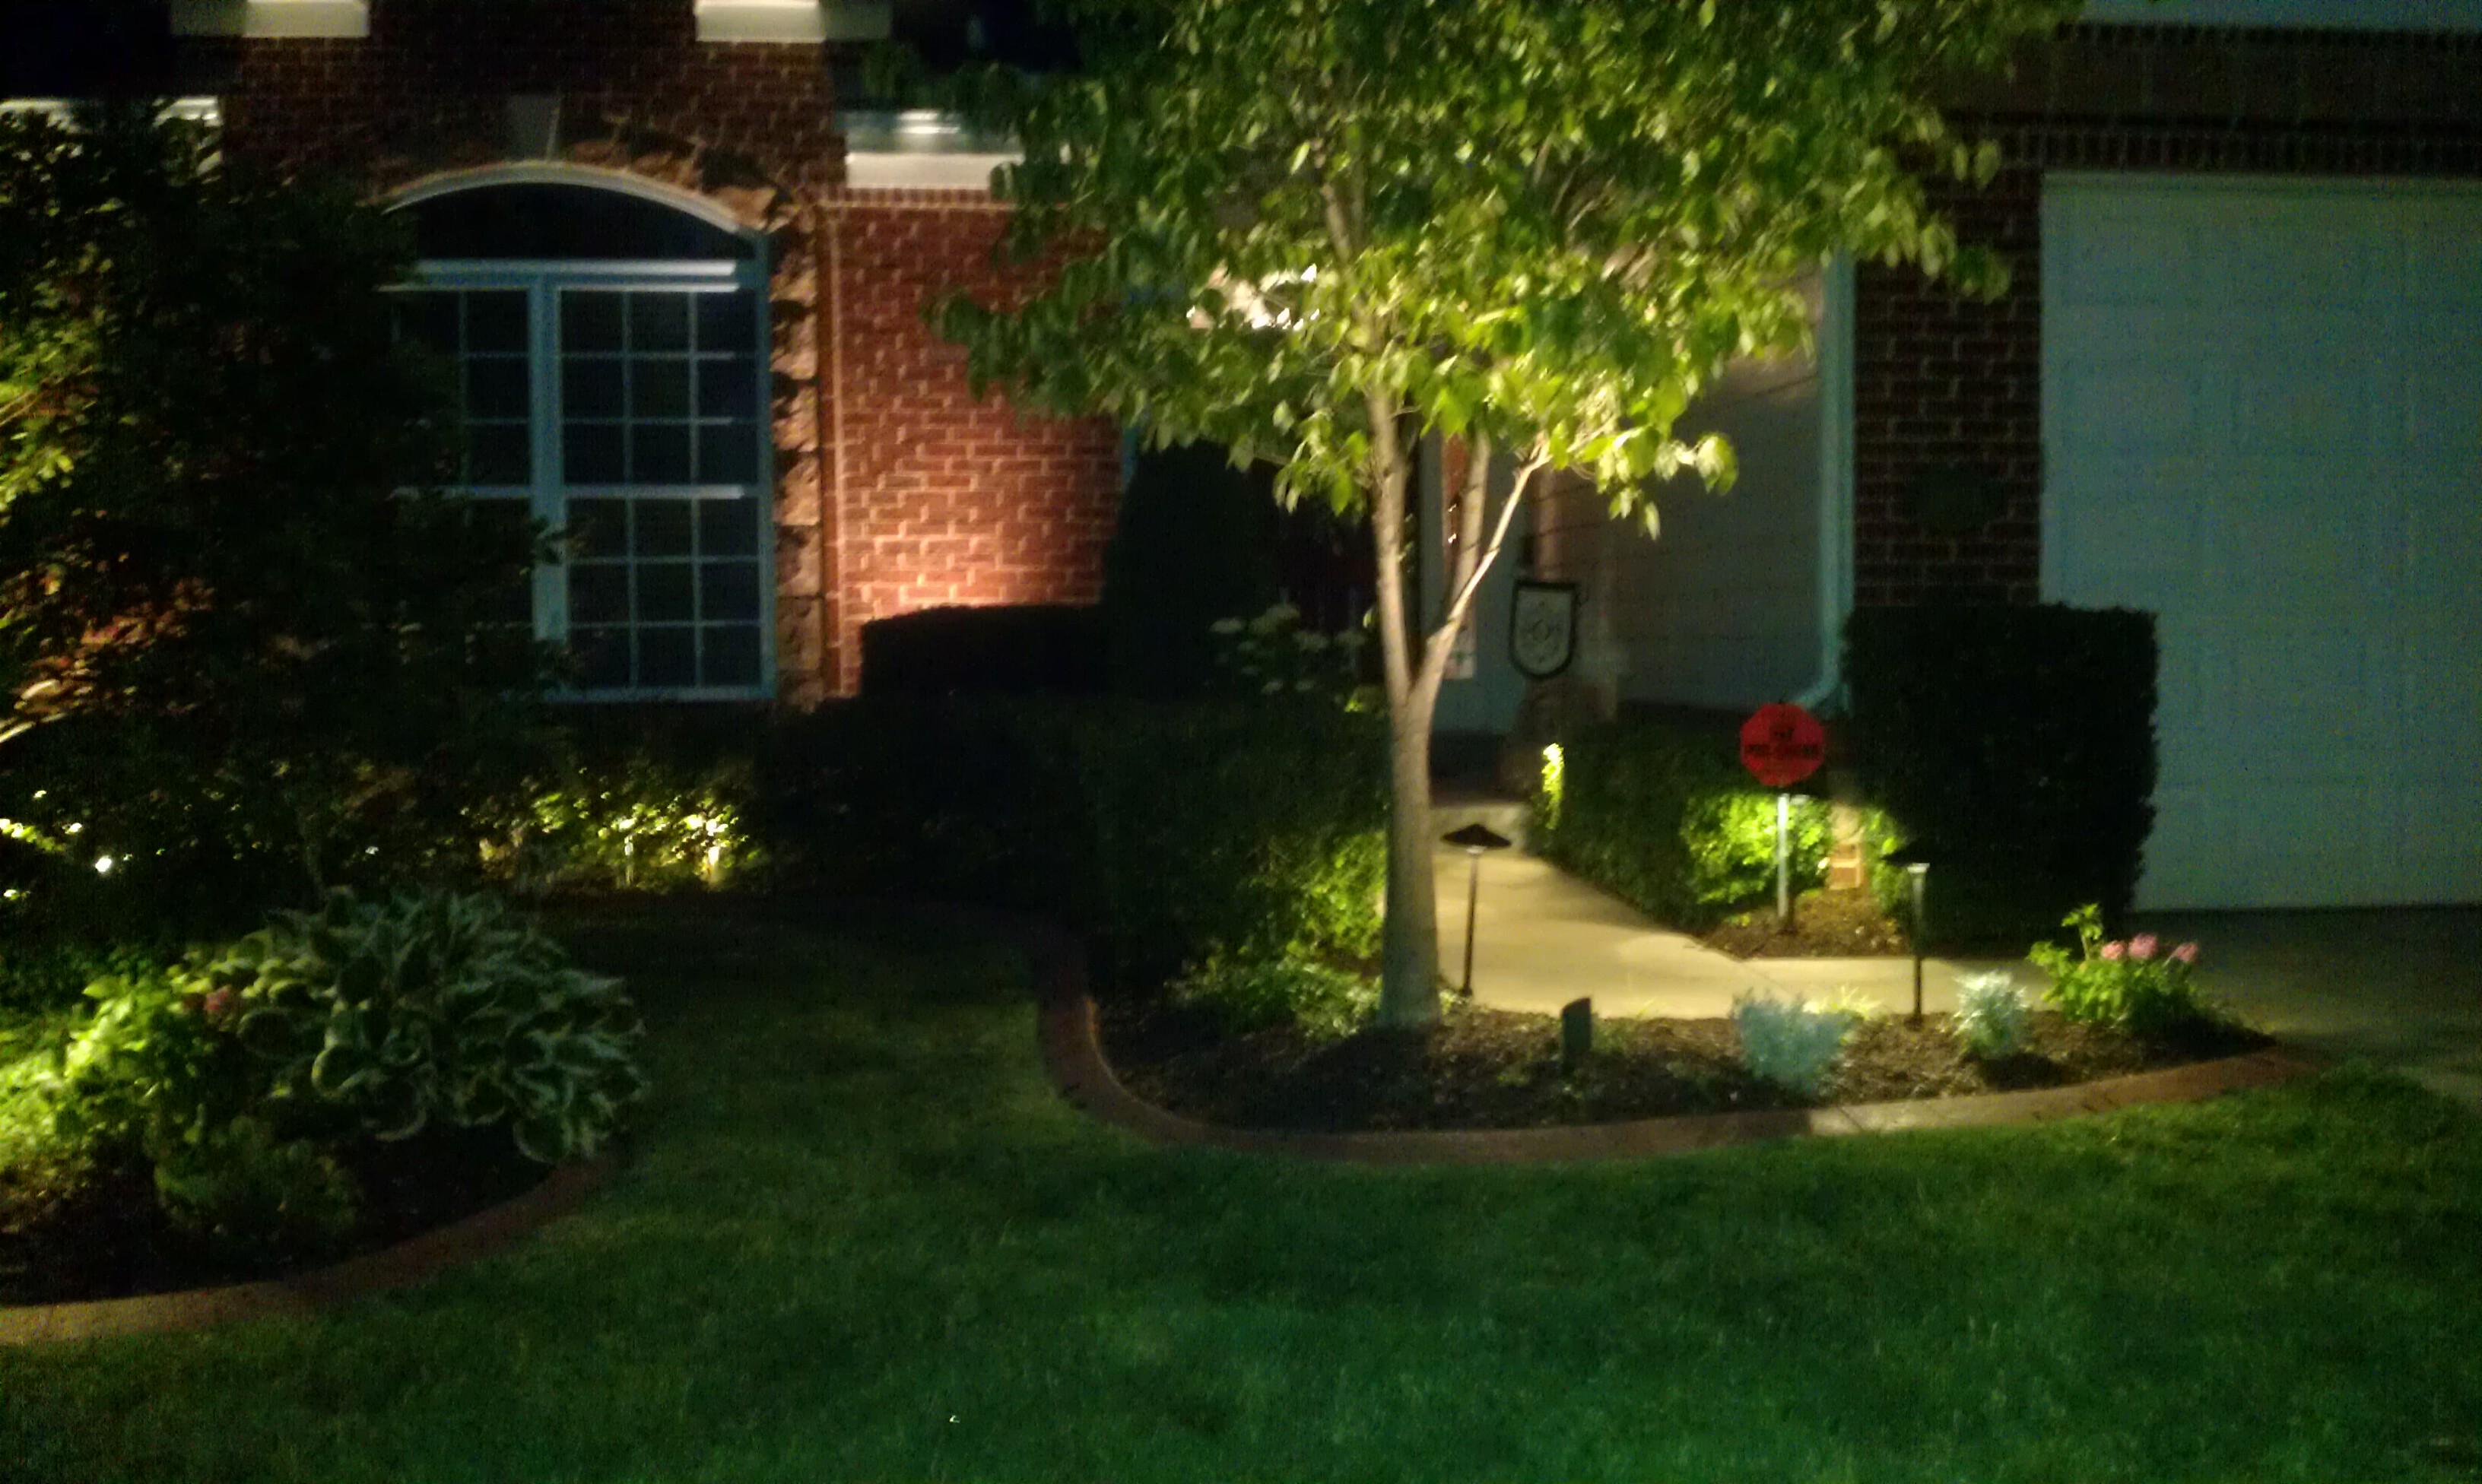 twilight low voltage outdoor lighting. Black Bedroom Furniture Sets. Home Design Ideas